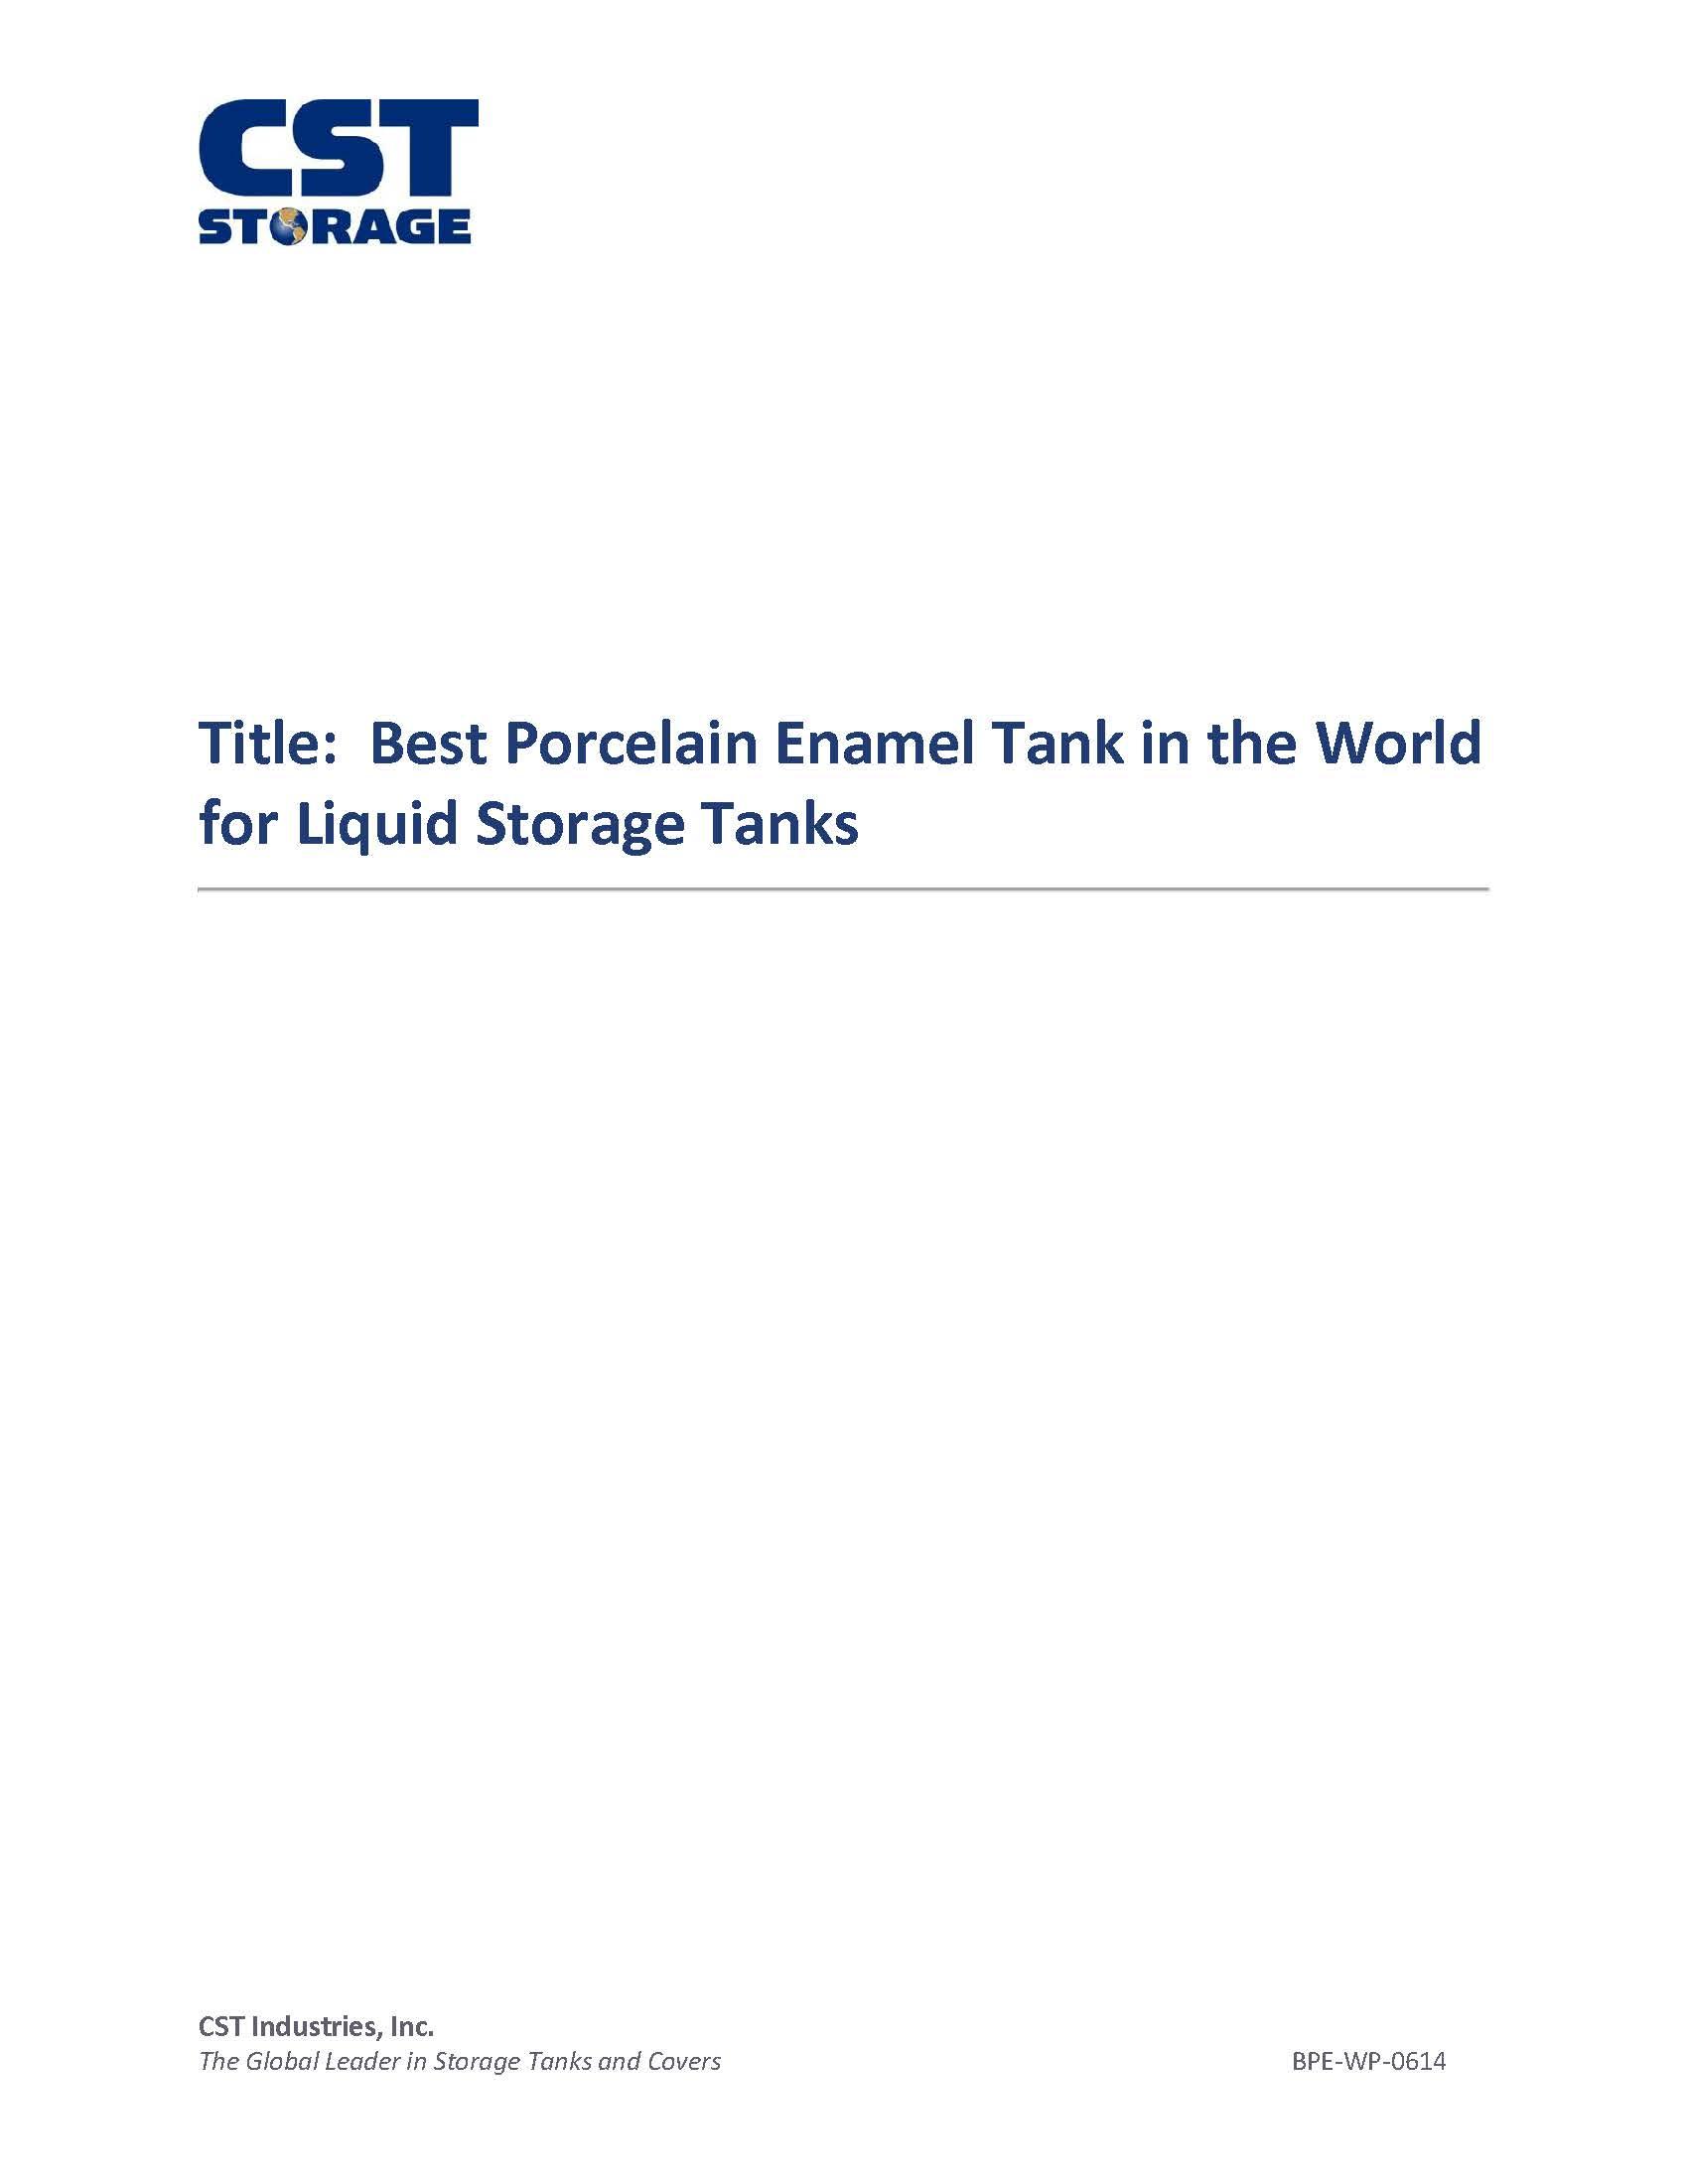 Best Porcelain Enamel Tank in the World for Liquid Storage Tanks